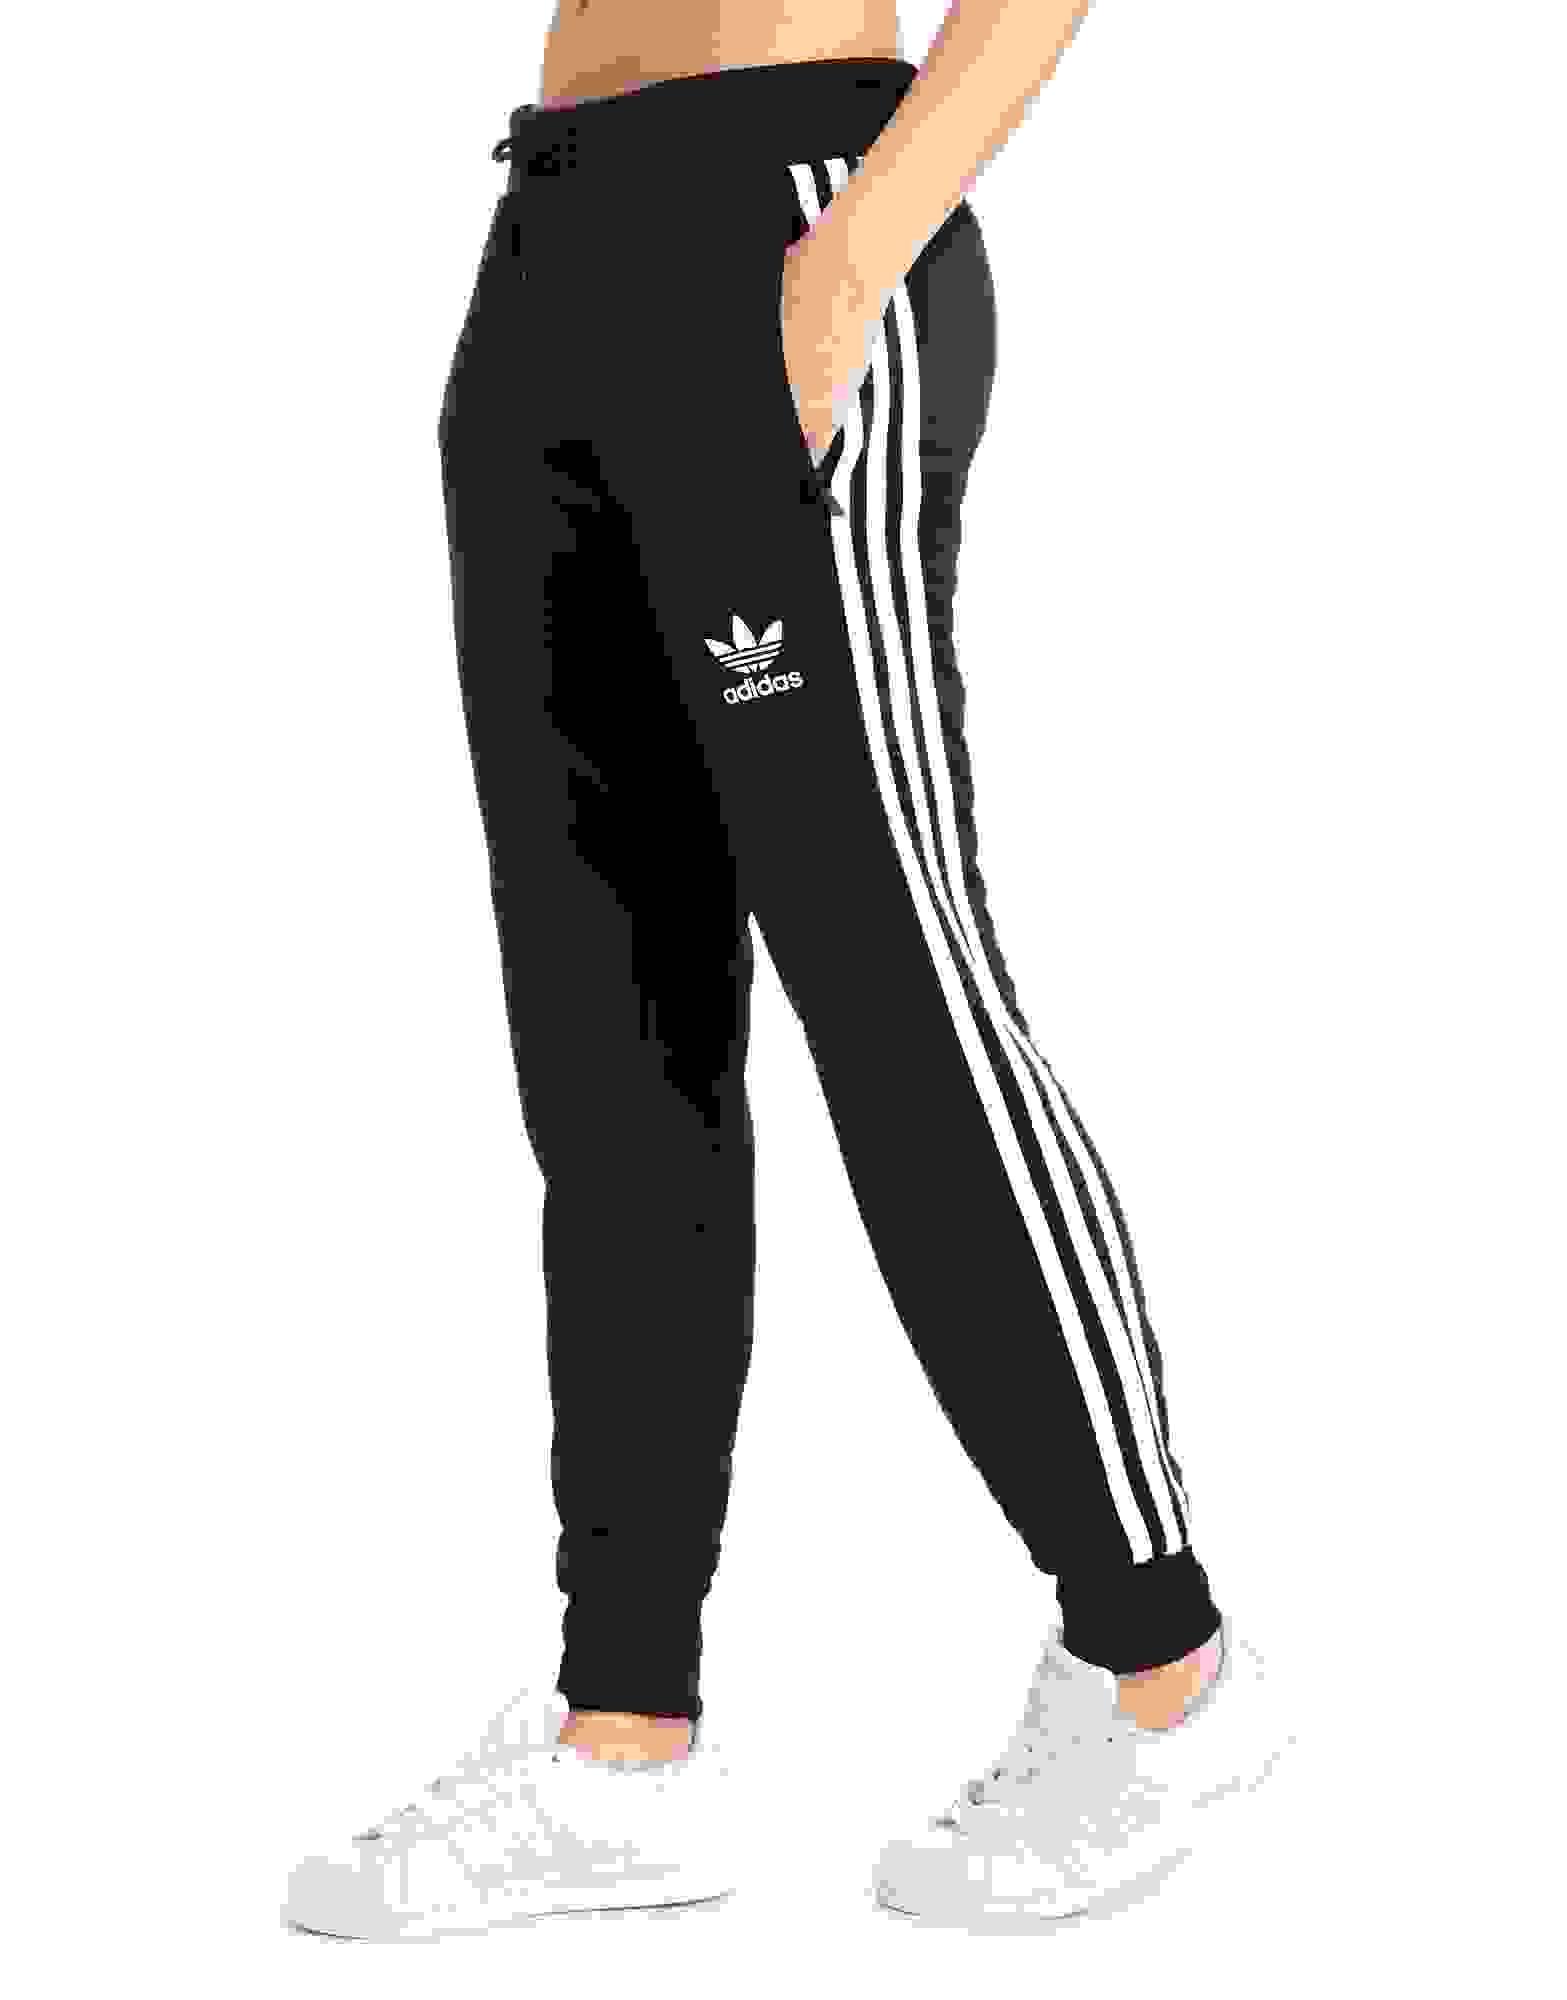 adidas 3 stripe pants. adidas originals poly 3-stripes pants 3 stripe jd sports